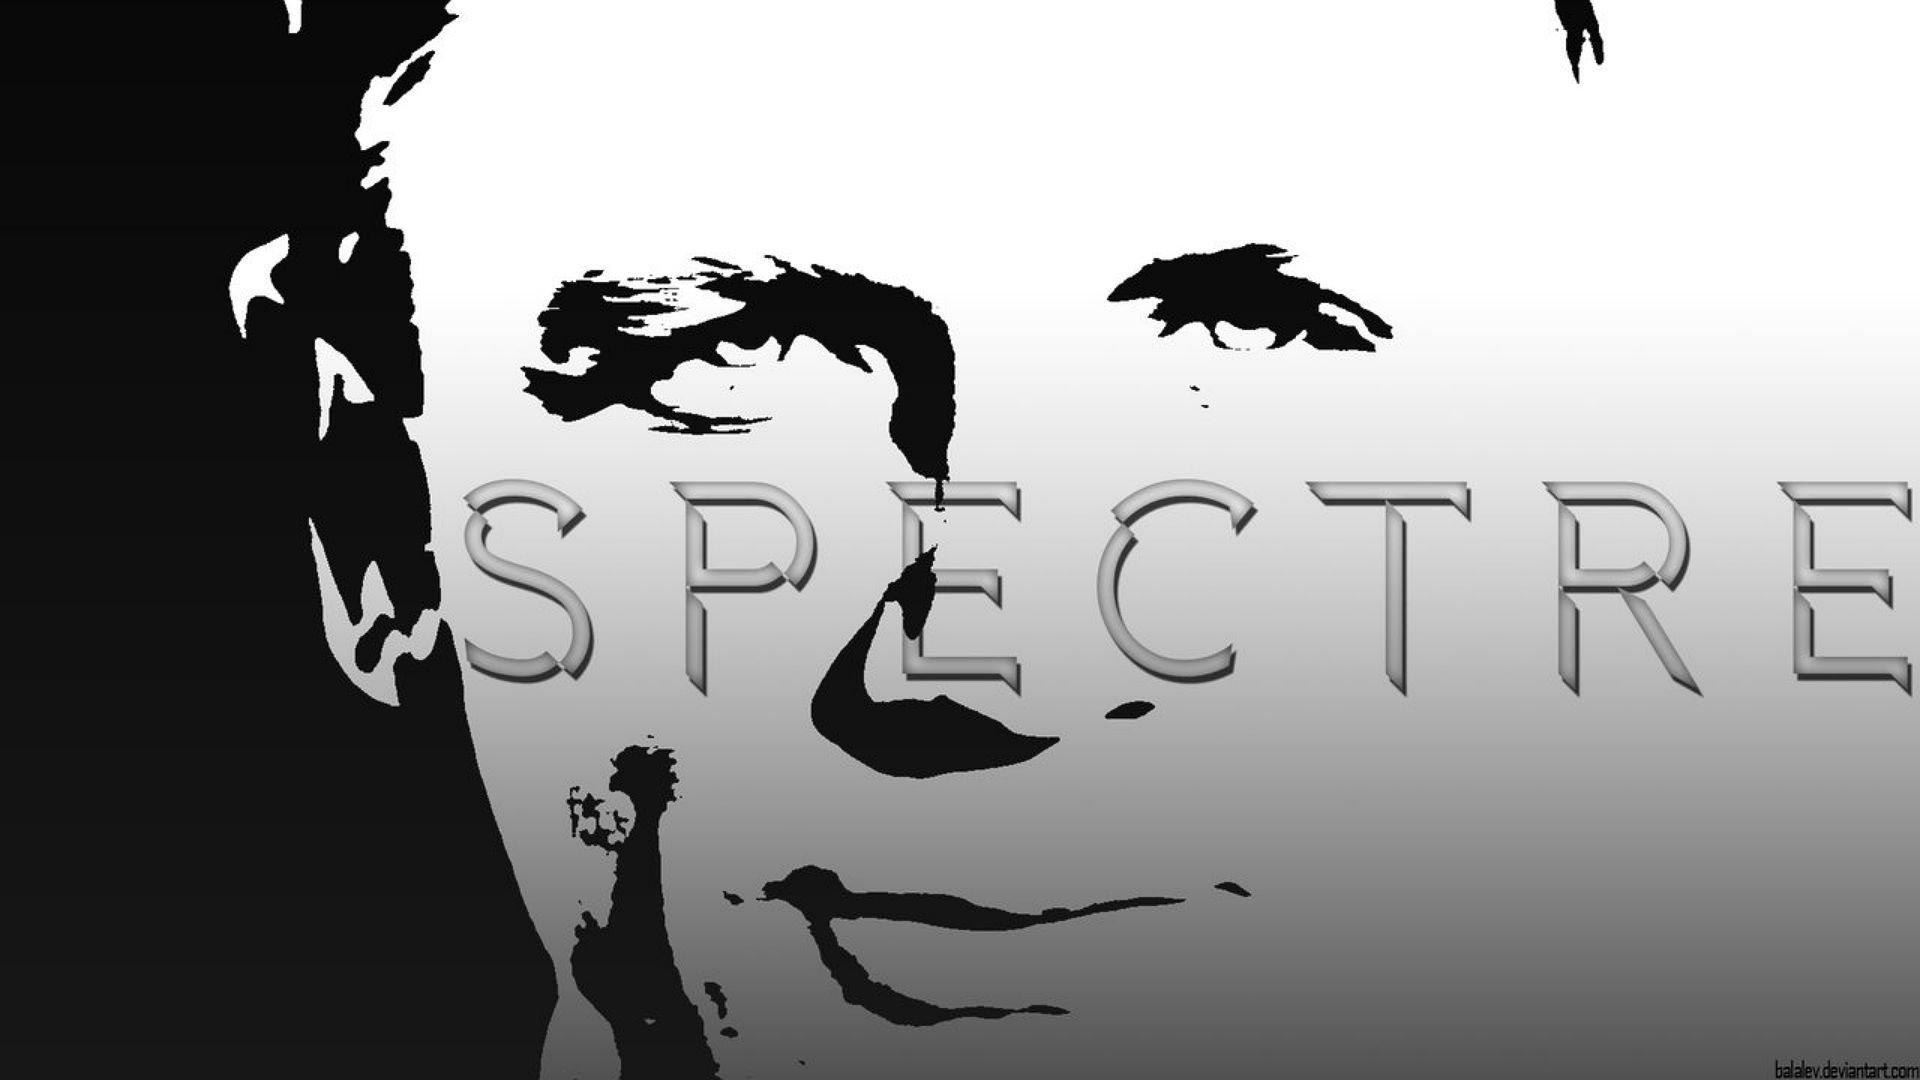 James bond spectre wallpapers pictures images - James bond wallpaper iphone 5 ...